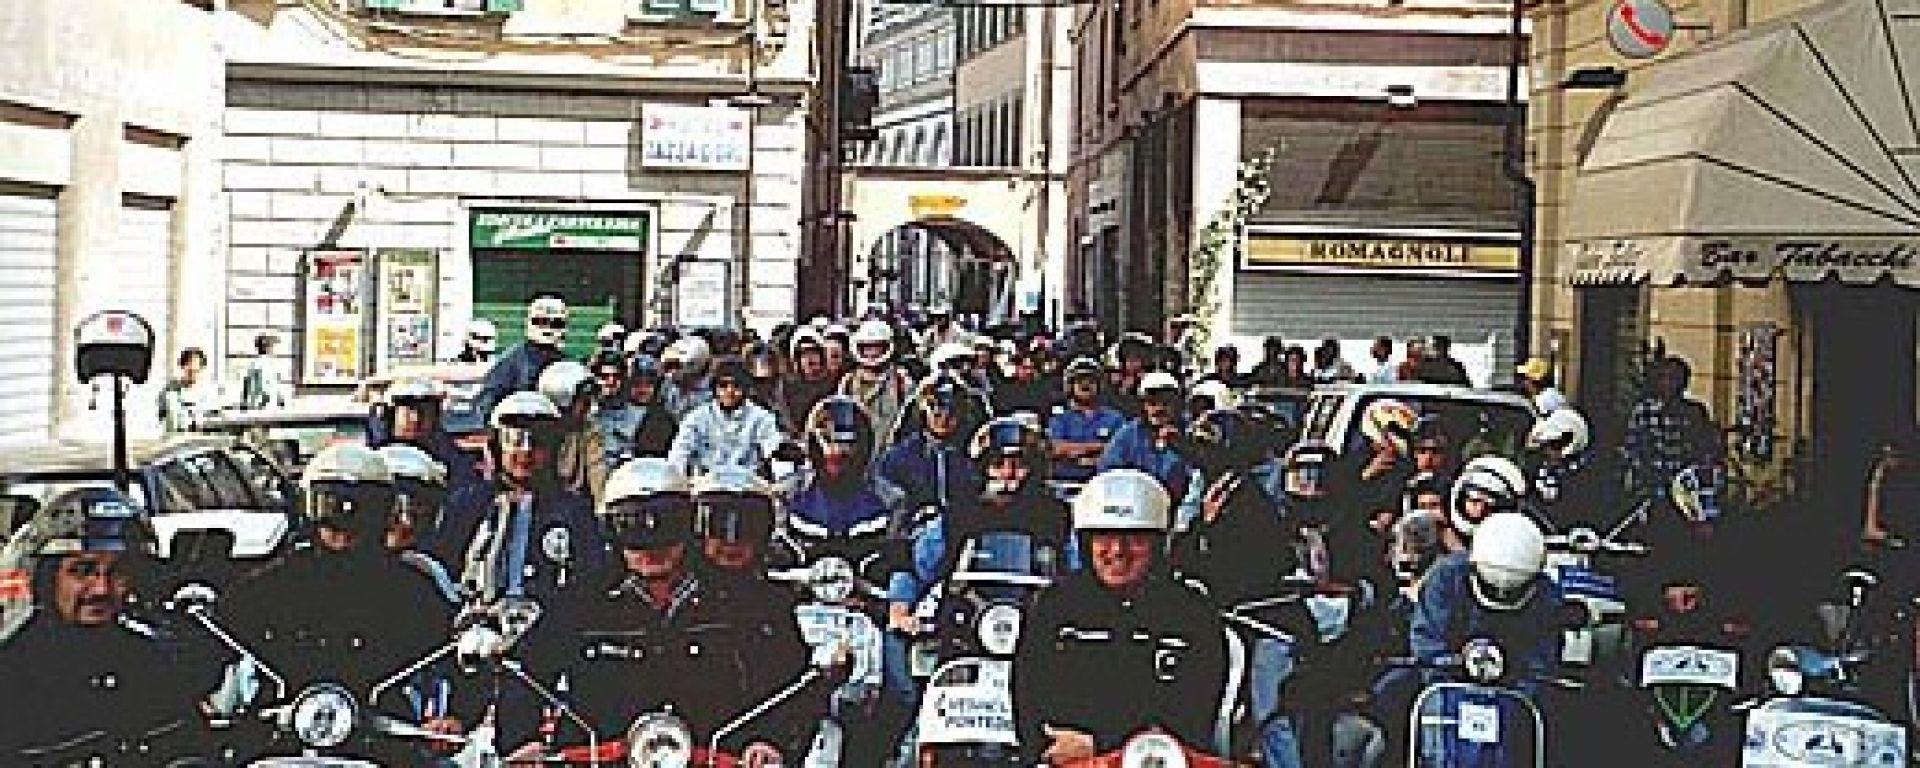 Eurovespa 2002